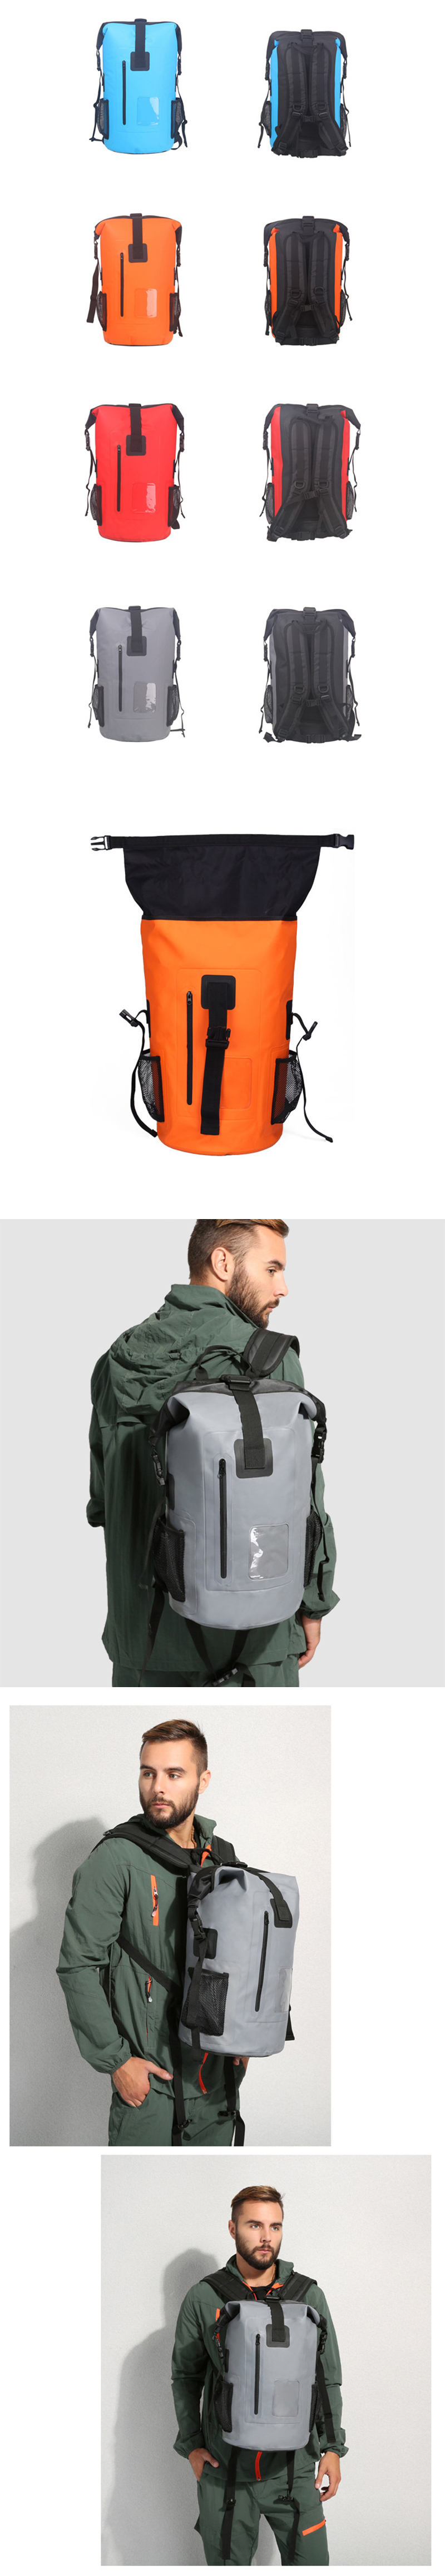 Waterproof DryBag Sac à dos 30 L tuffbag-Roll Top-commute//Voyage//Moto